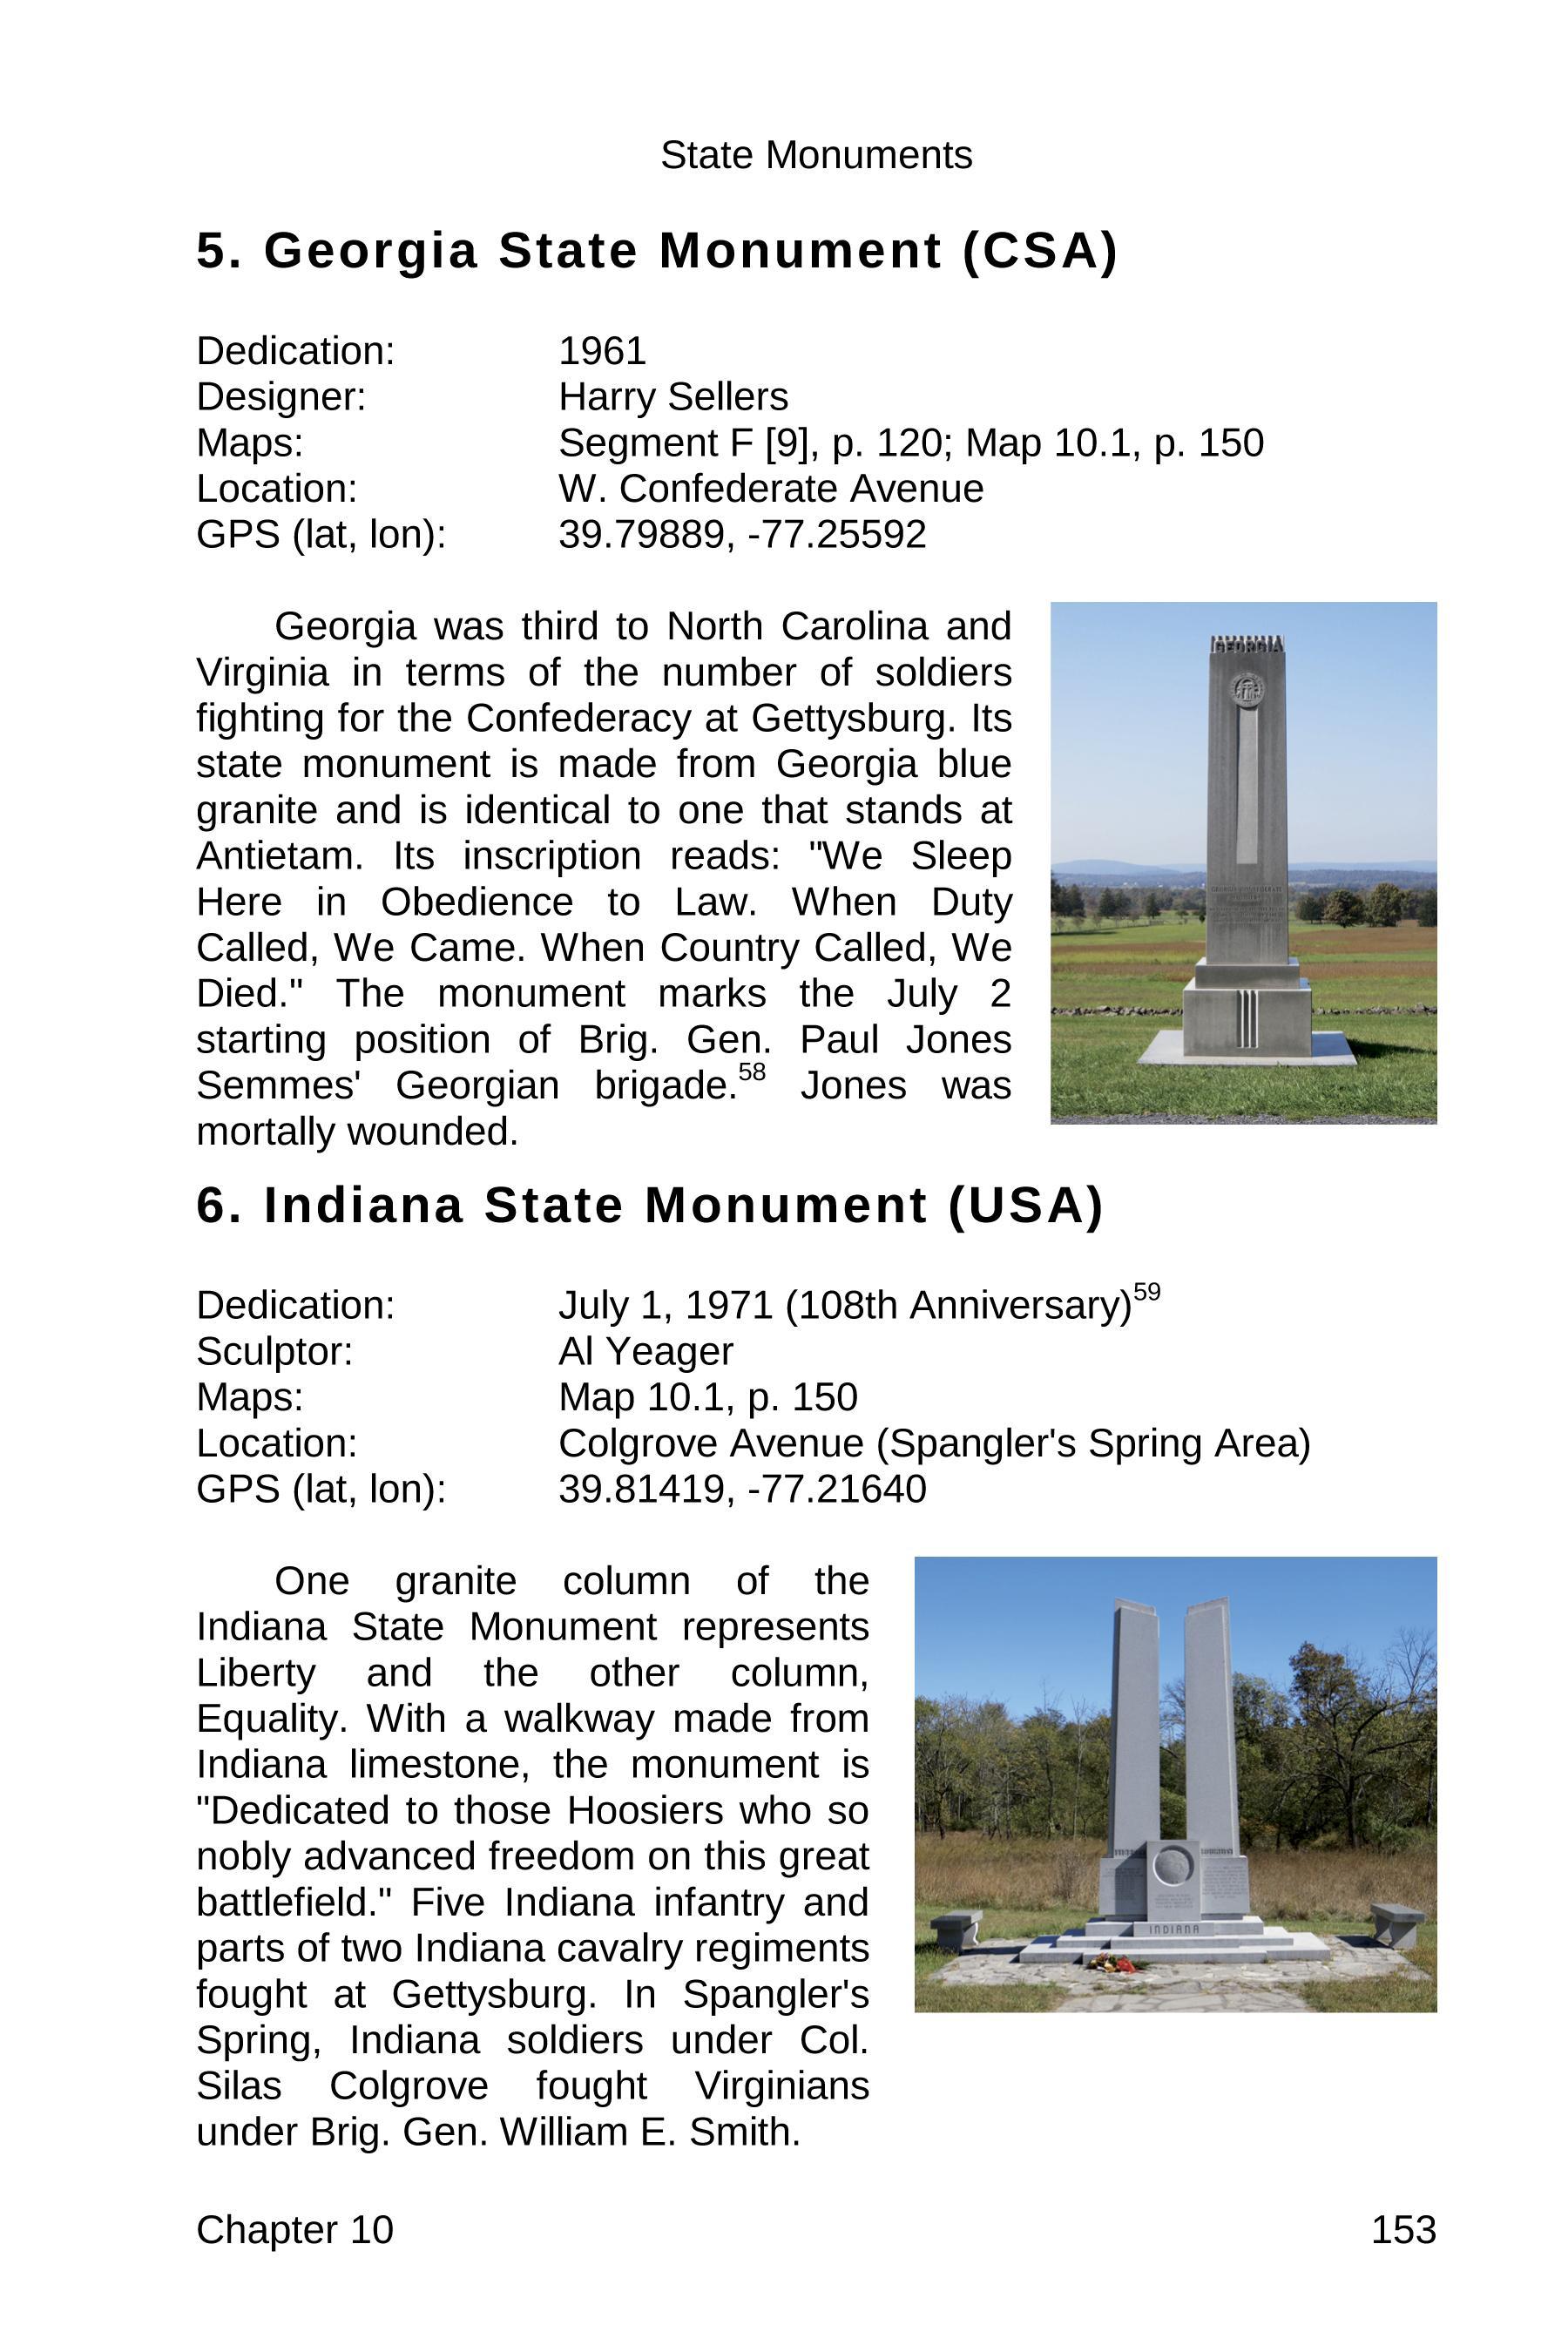 gettysburg state monuments sample 153